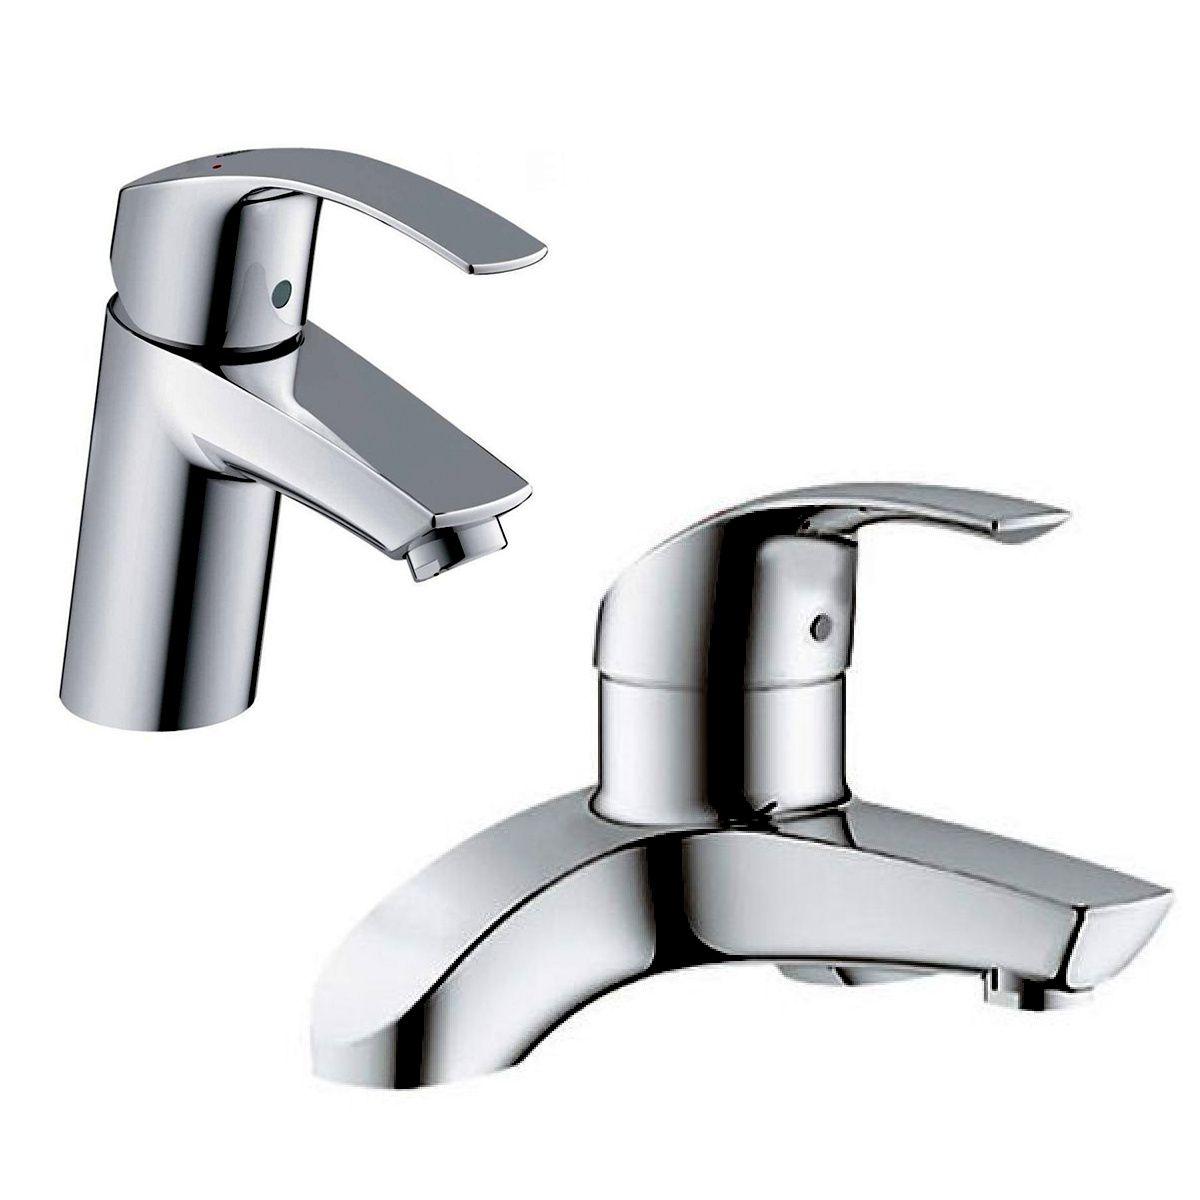 Grohe Eurosmart Basin Mixer And Bath Filler Uk Bathrooms